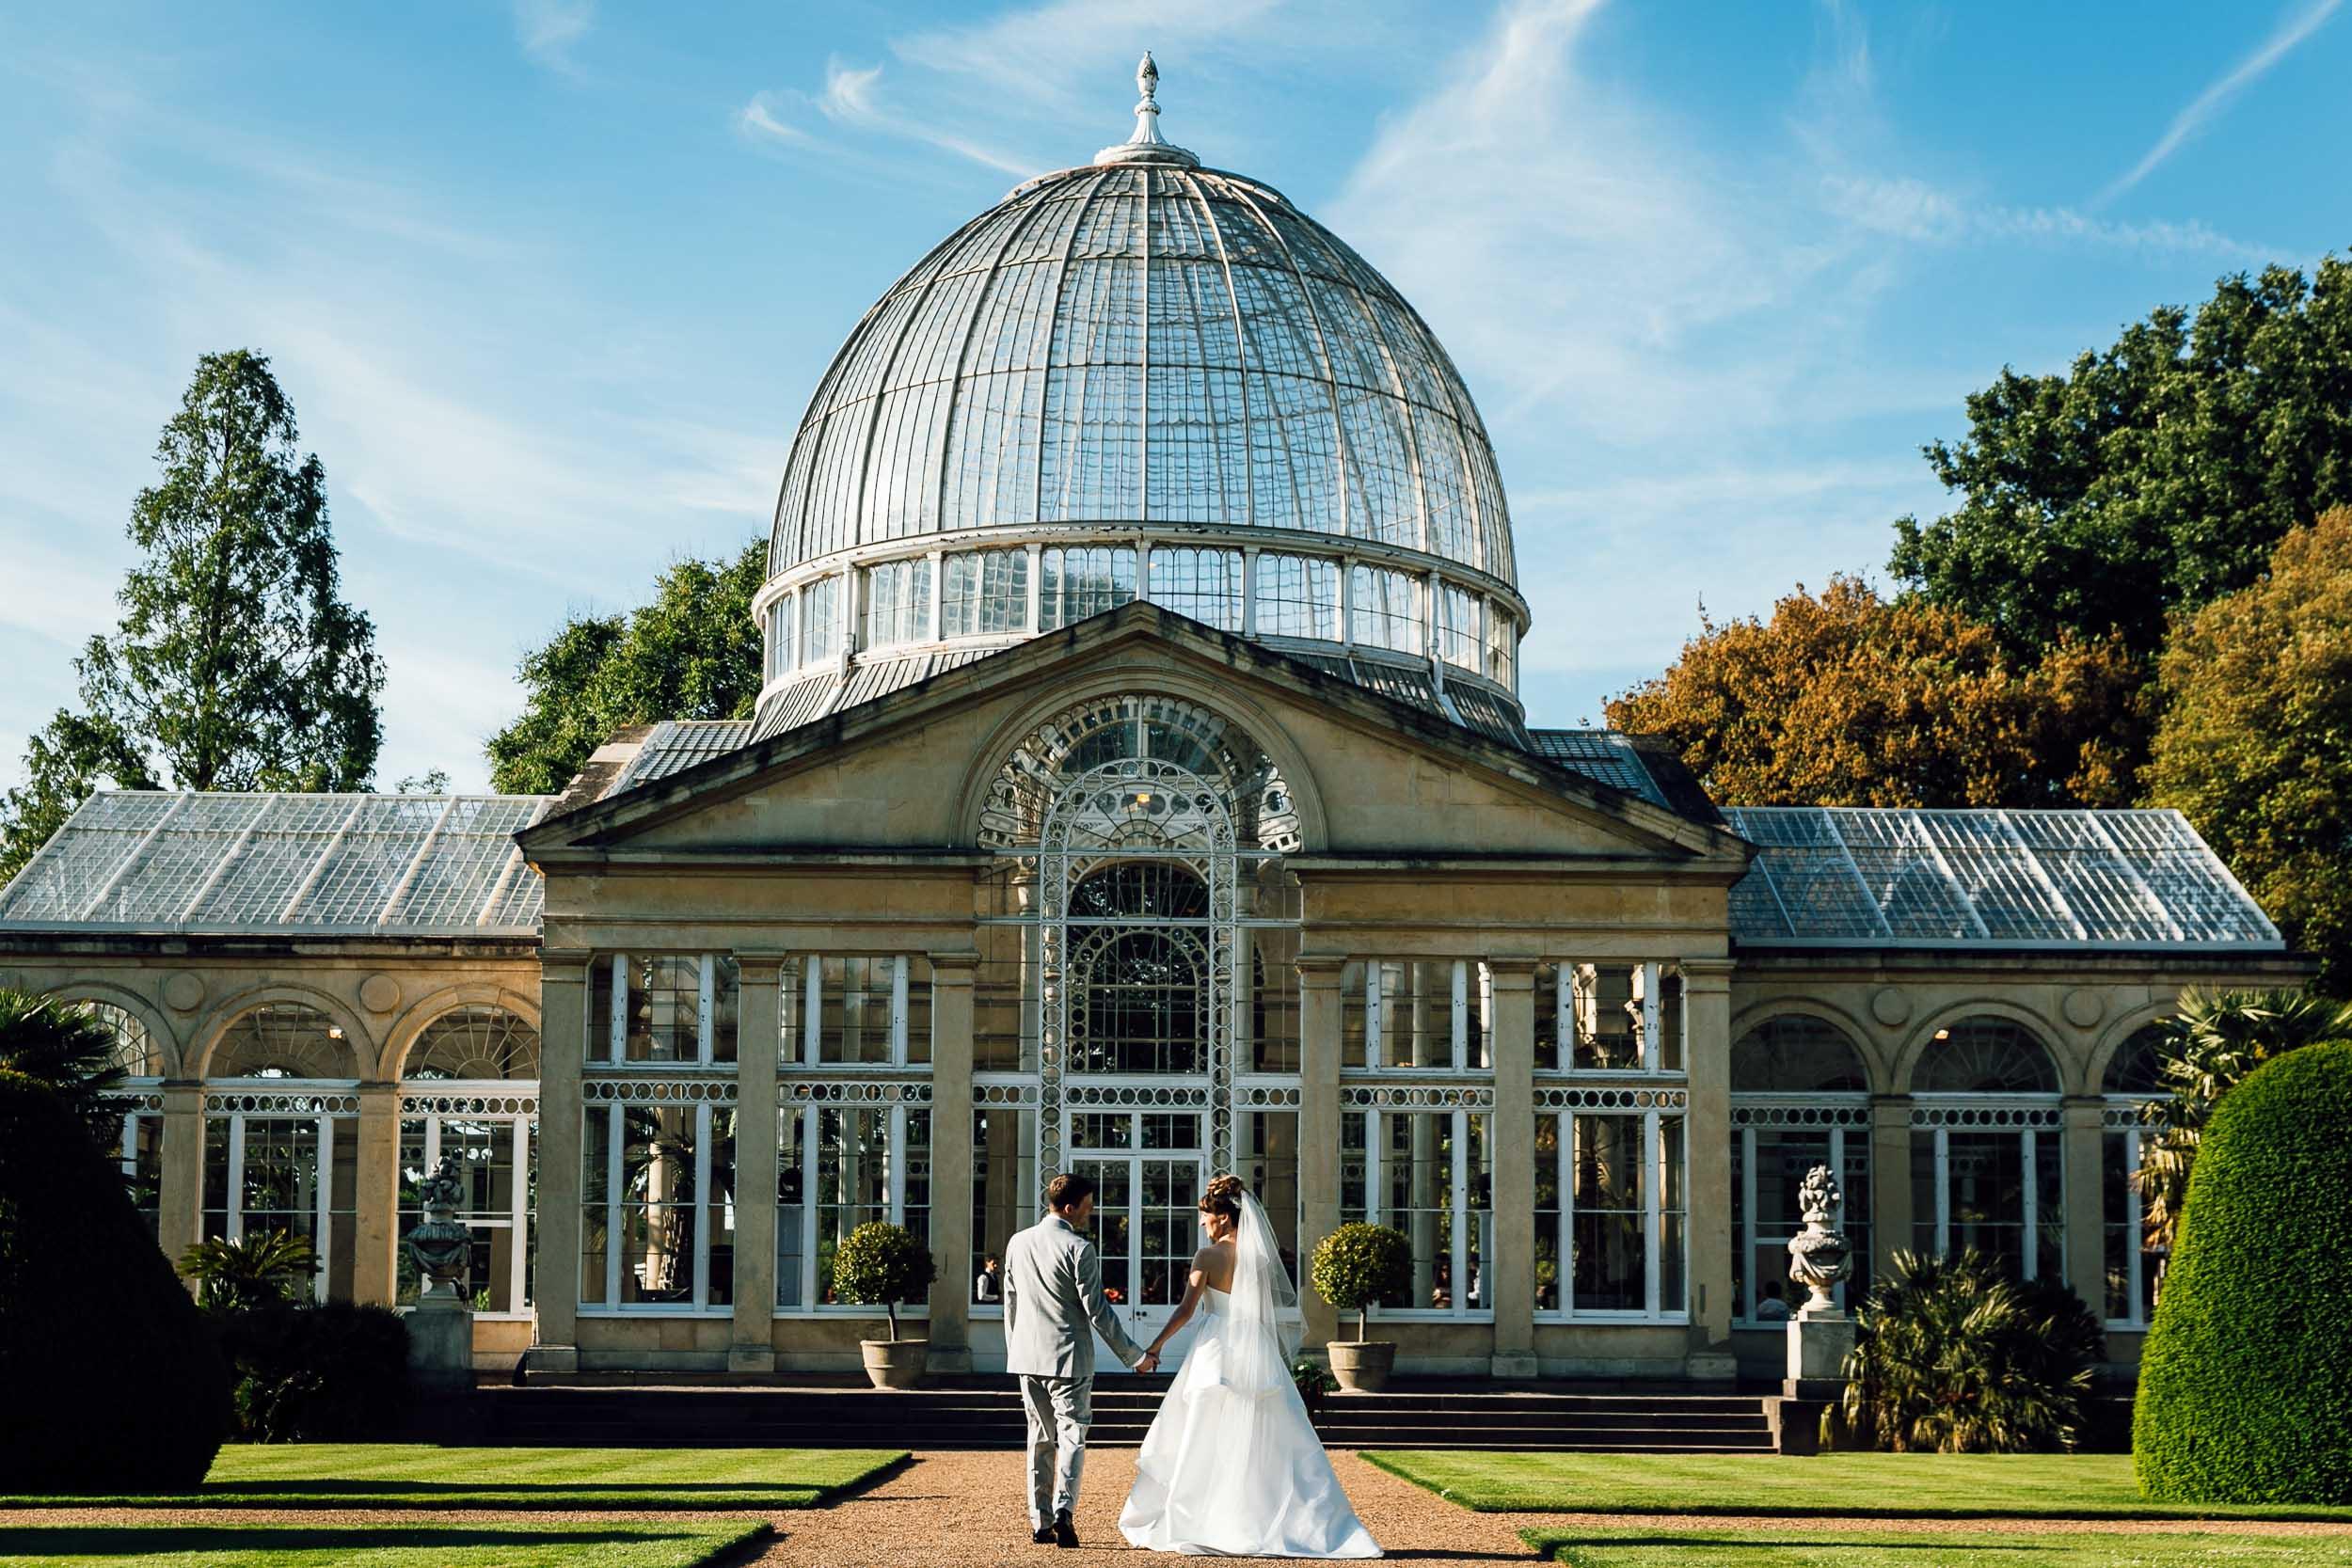 syon-house-wedding-photographer-london 117.jpg